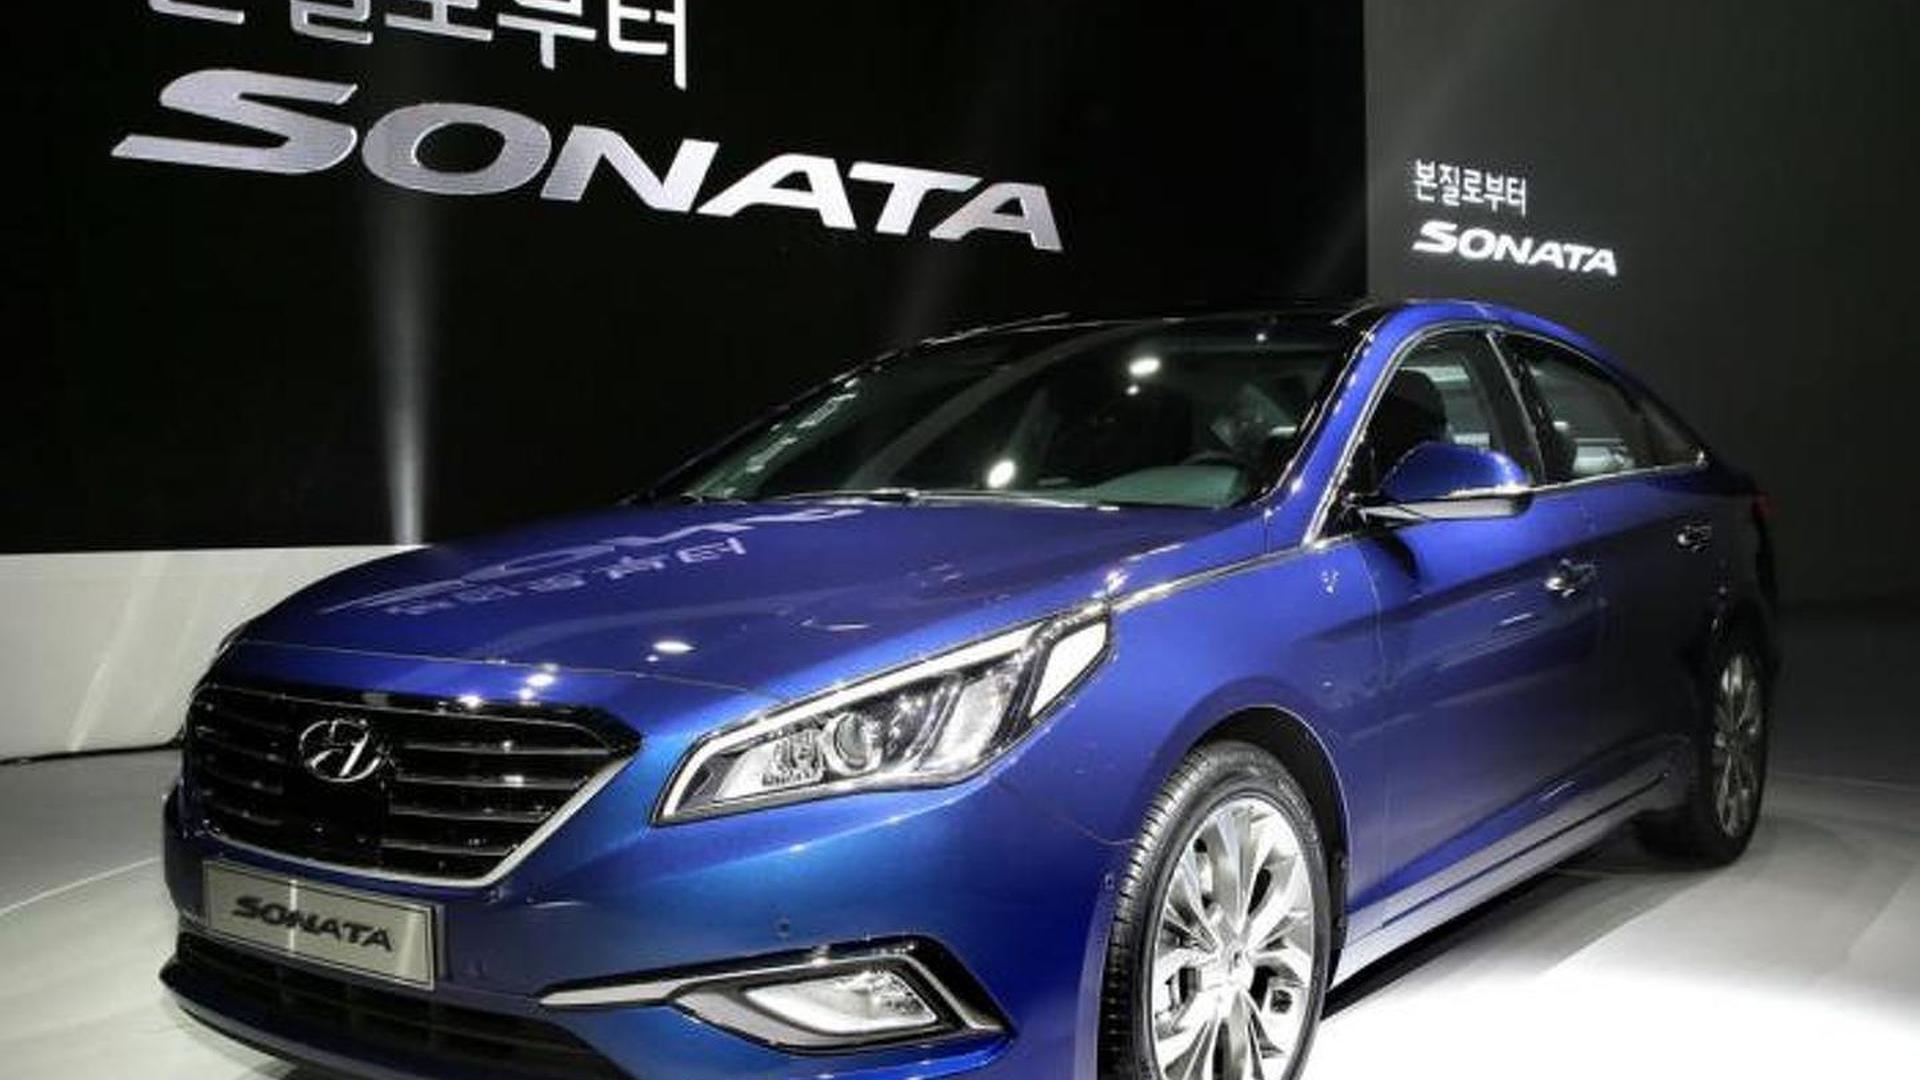 Larger and more upscale 2015 Hyundai Sonata goes official